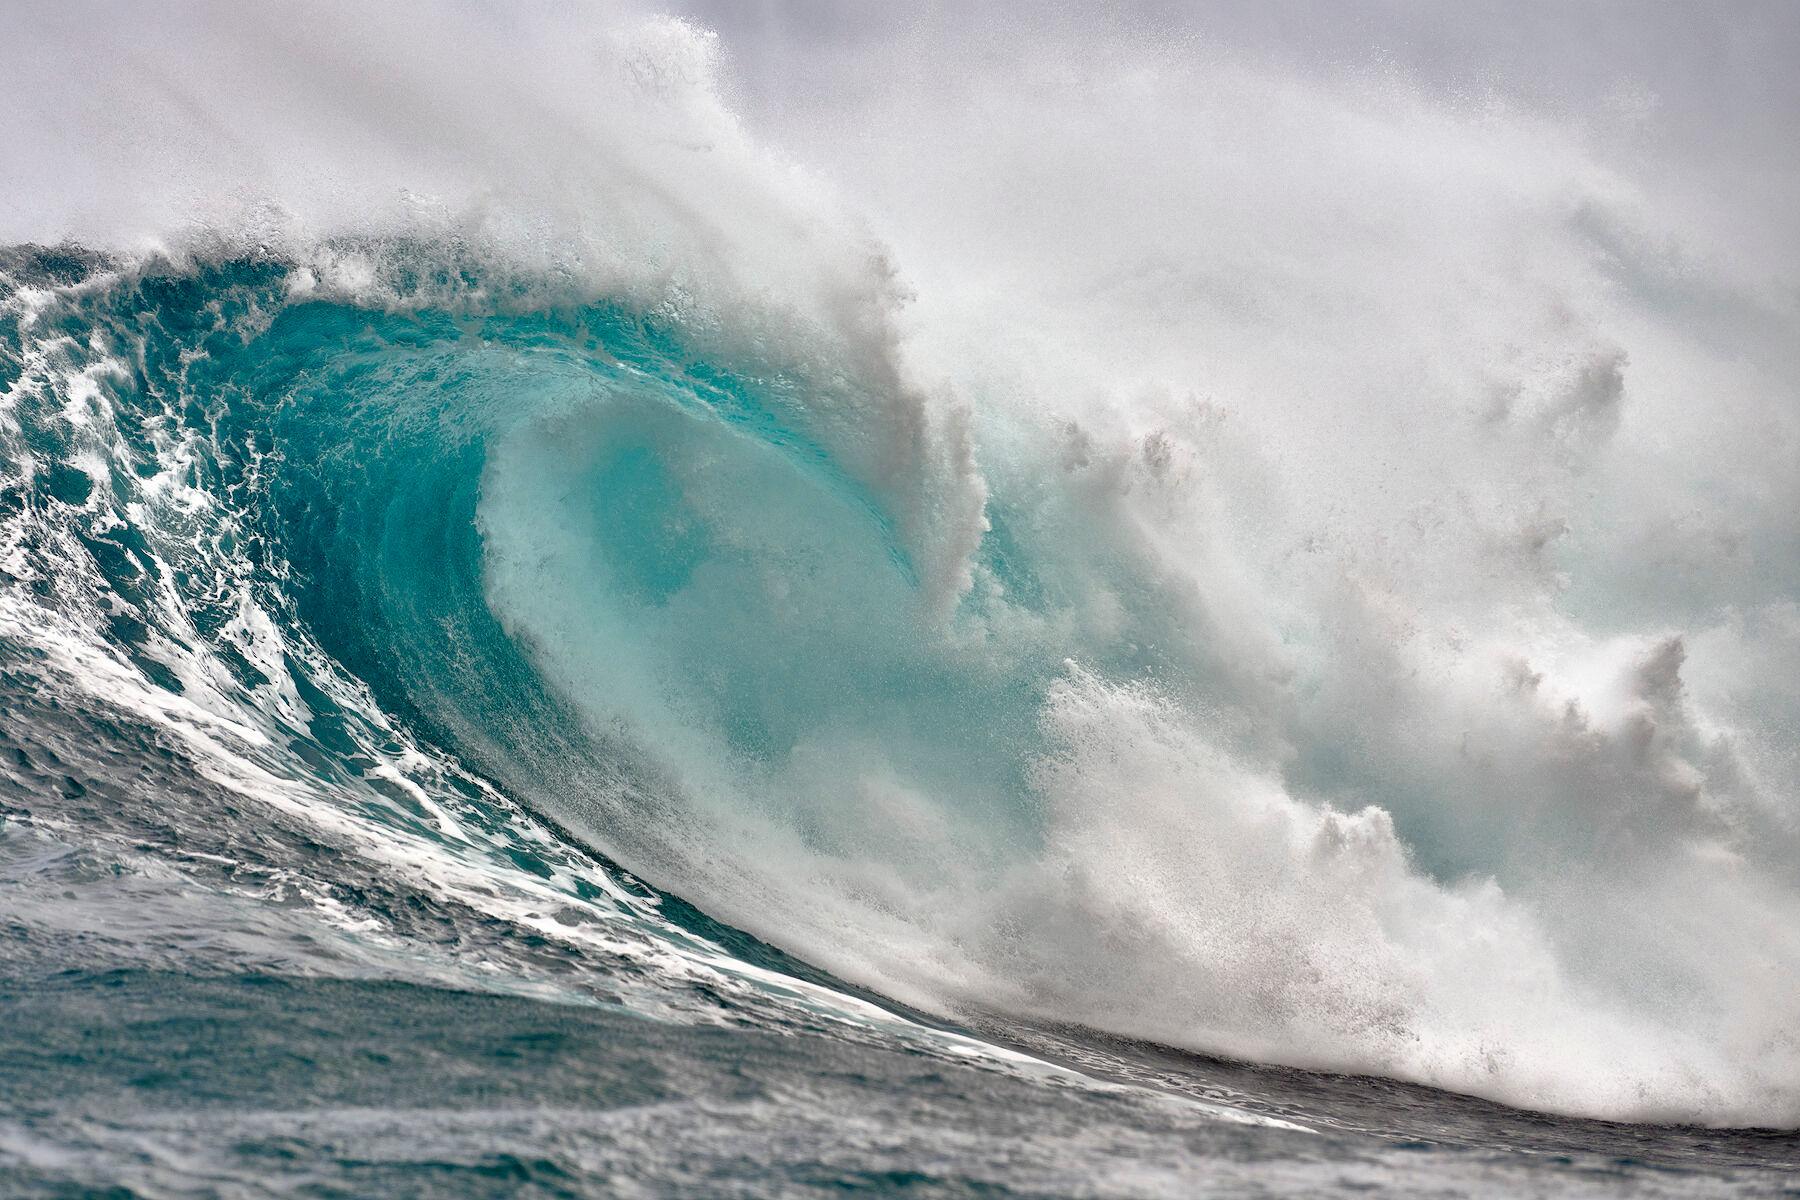 wave, jaws, peahi, surfing, blue, aqua, ocean, big wave, biggest wave, big wave, photo